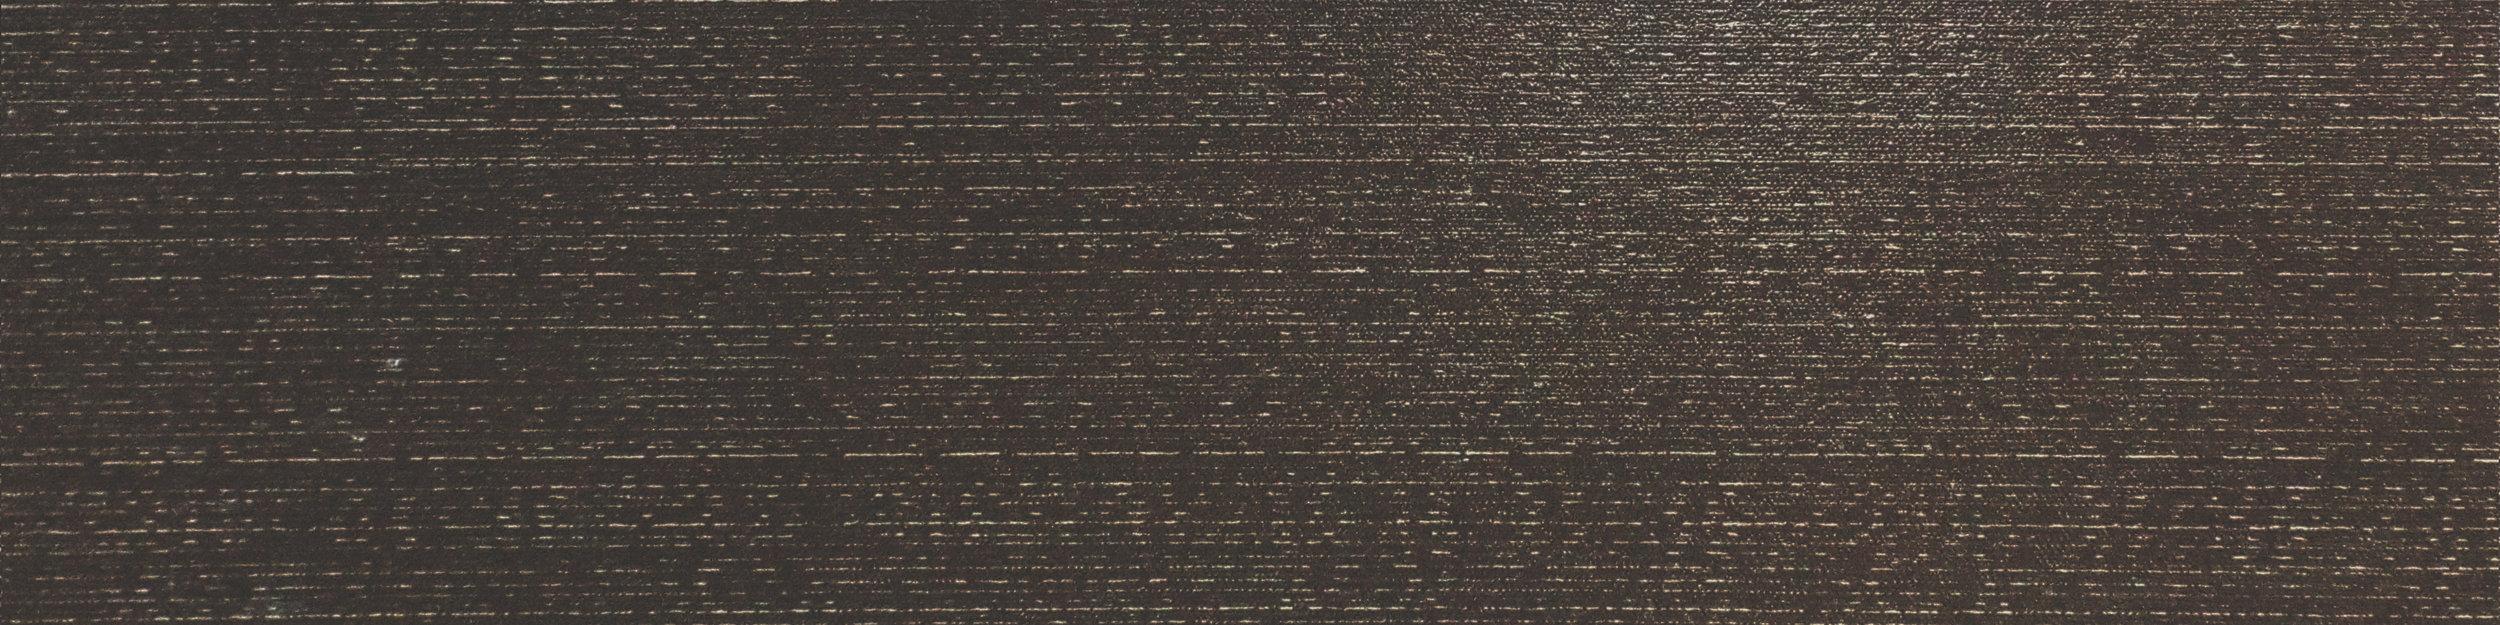 "Zodiac - Chocolate 6""x24""   15.50 SF/CTN  16 PC/CTN  48 CTN/PLT"